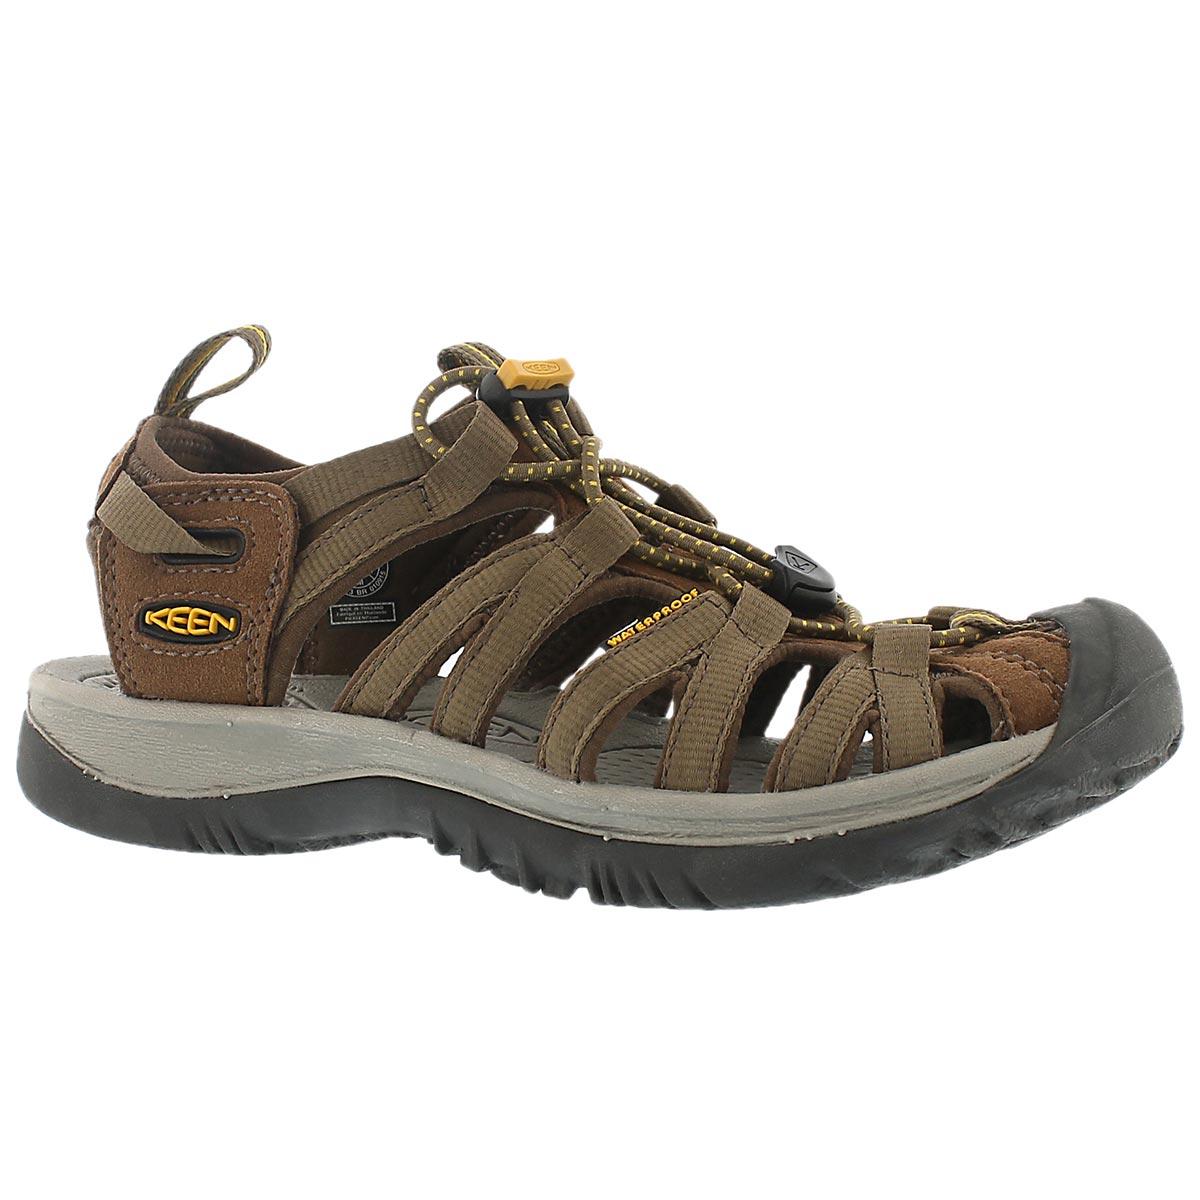 Women's WHISPER CLASSIC coffee/yellow sport sandal